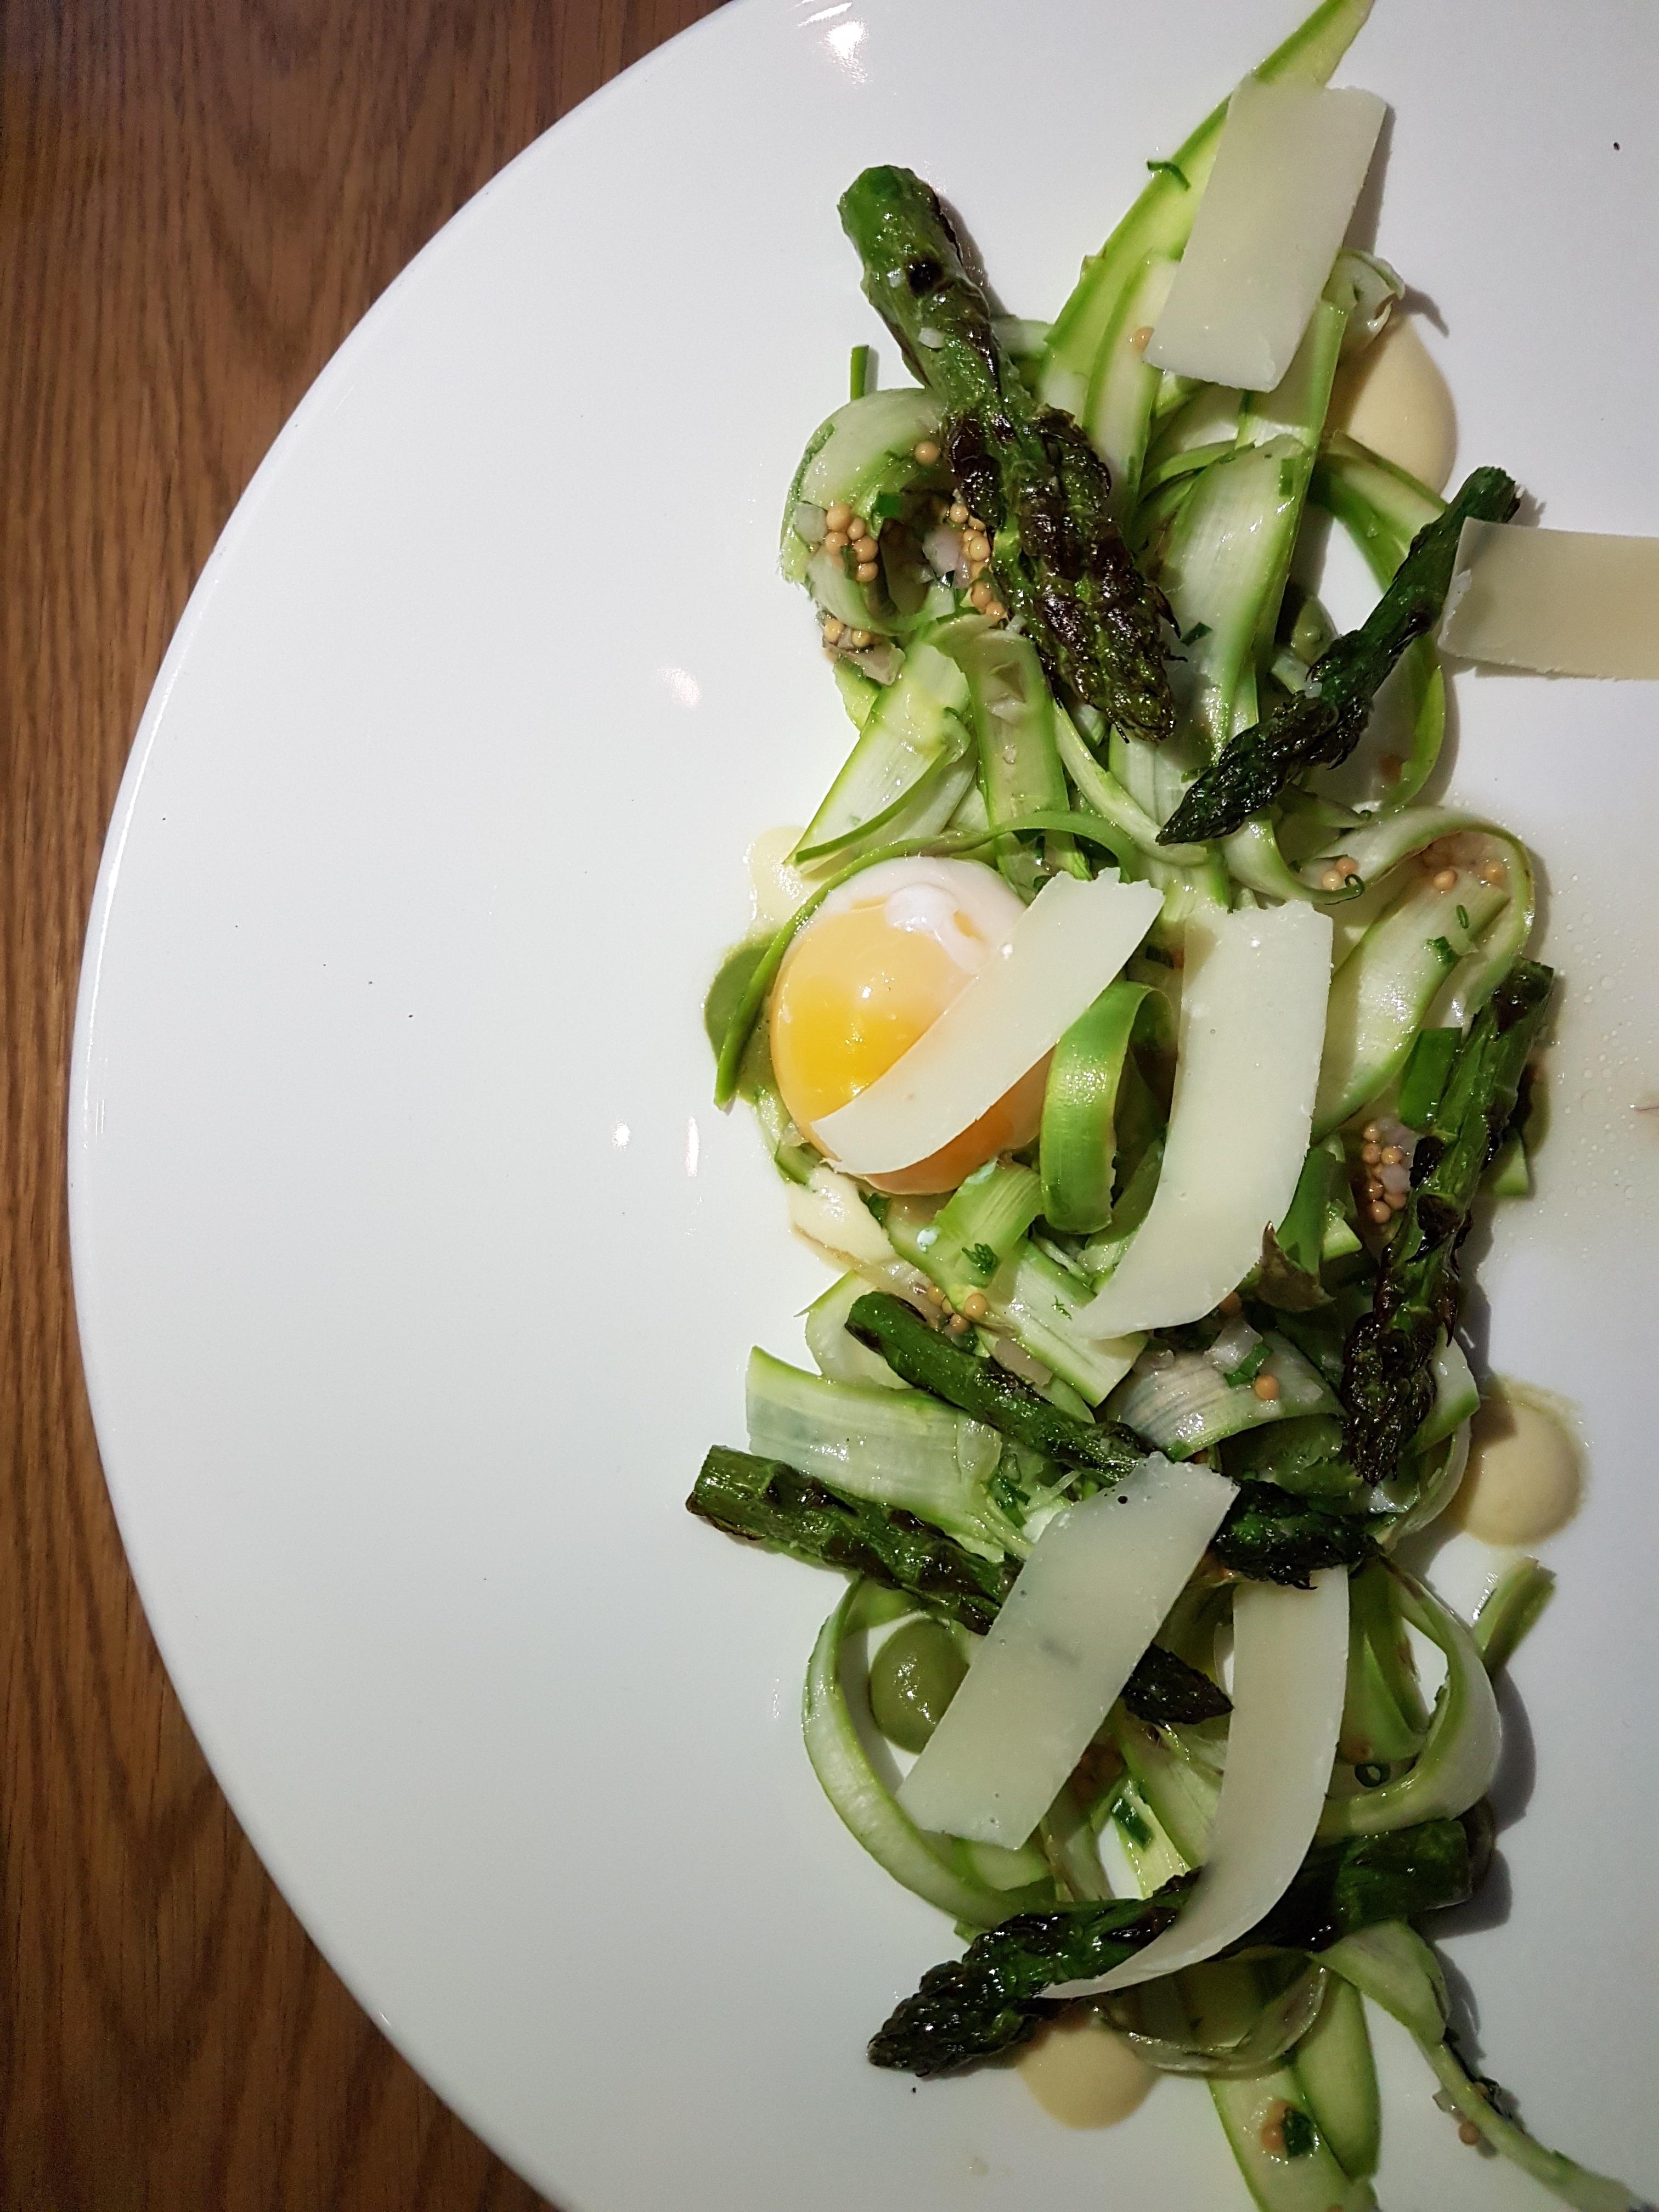 Ikanos, salade d'asperges